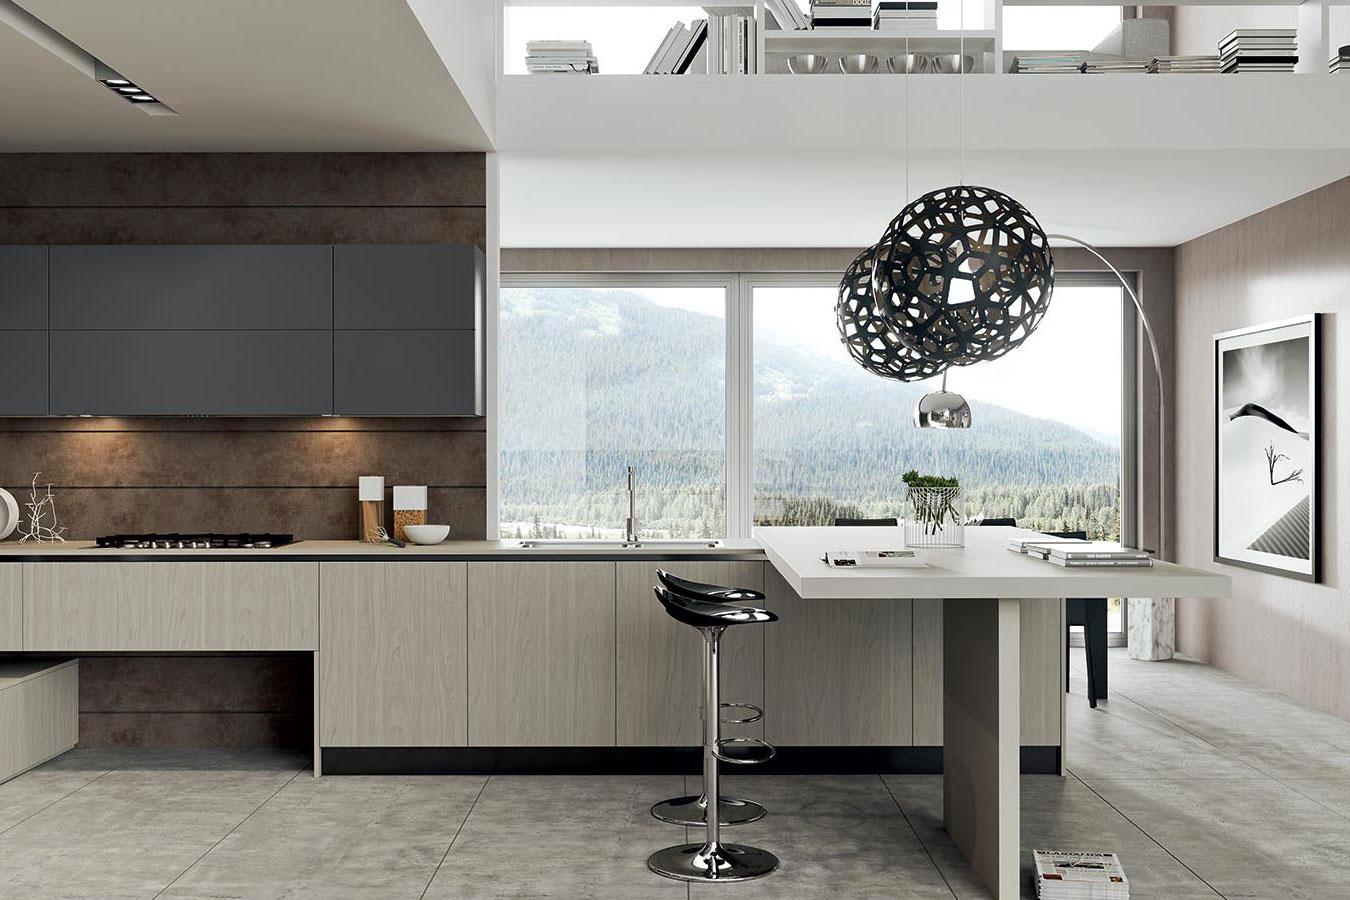 Cucina luna di arredo3 righetti mobili novara for Oggettistica cucina online